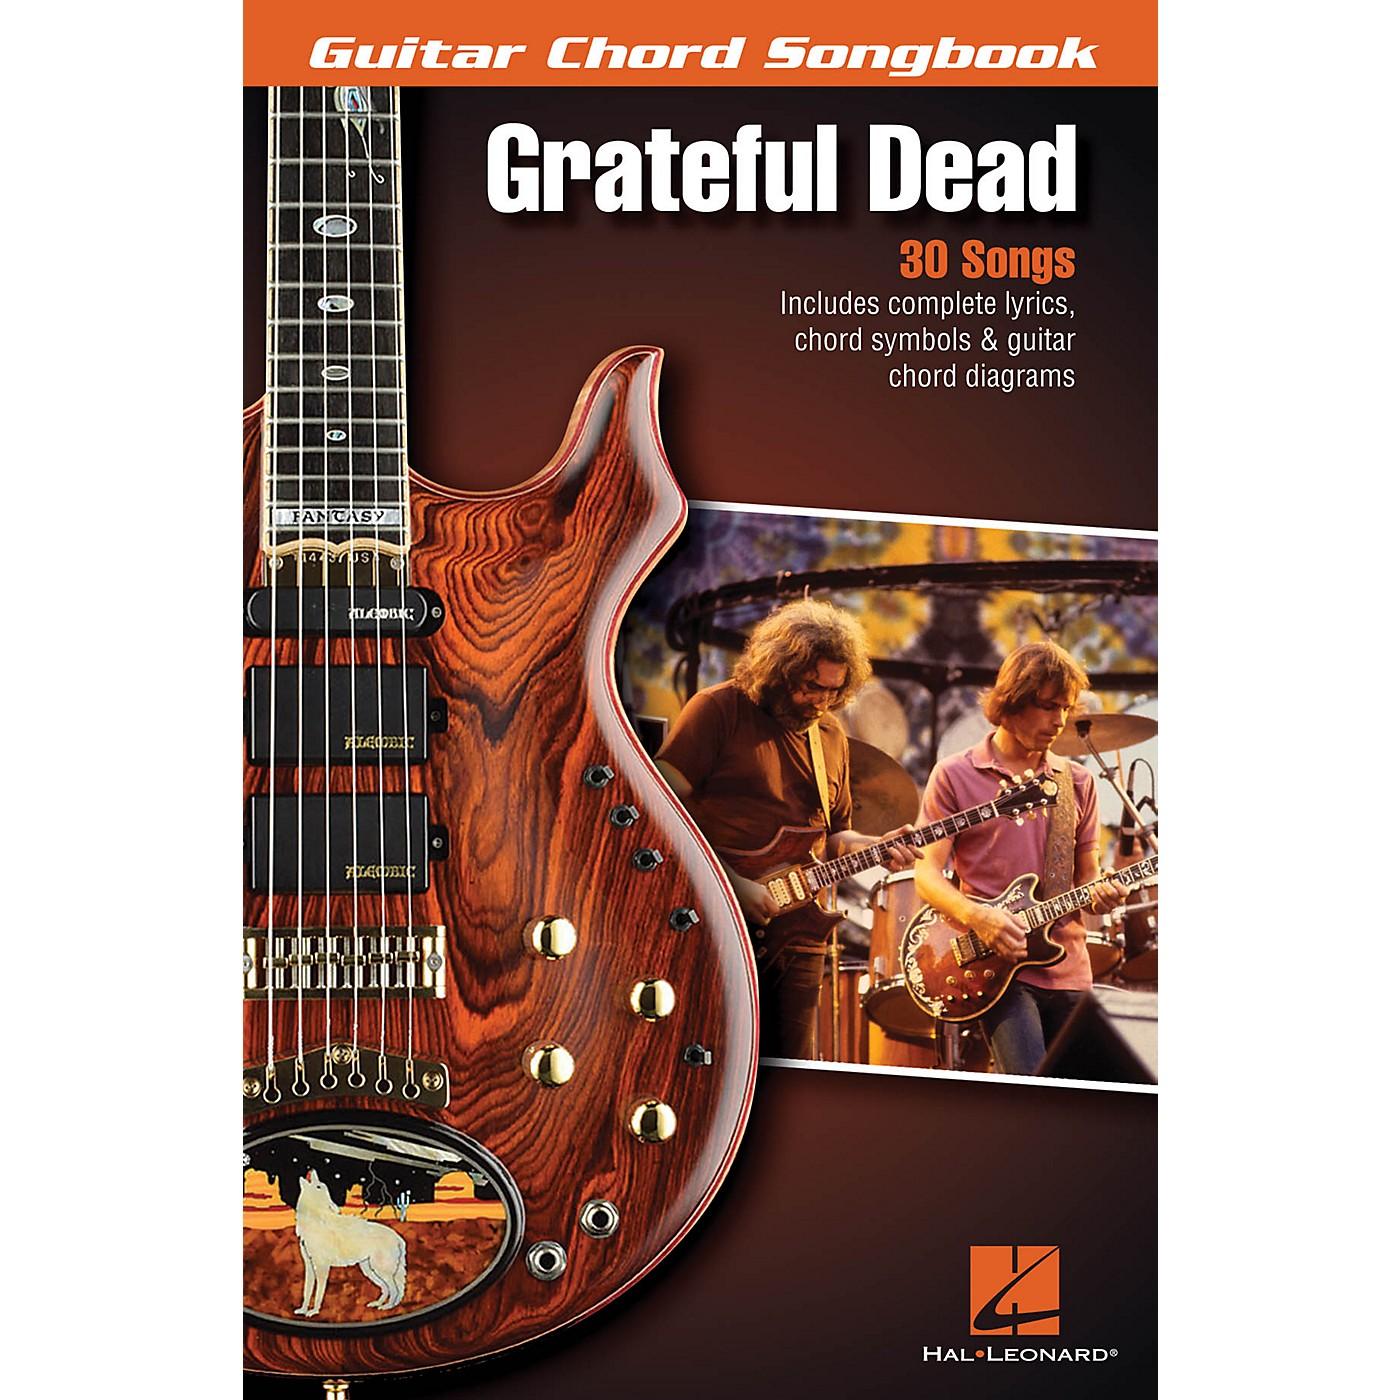 Hal Leonard Grateful Dead - Guitar Chord Songbook Guitar Chord Songbook Series Softcover Performed by Grateful Dead thumbnail